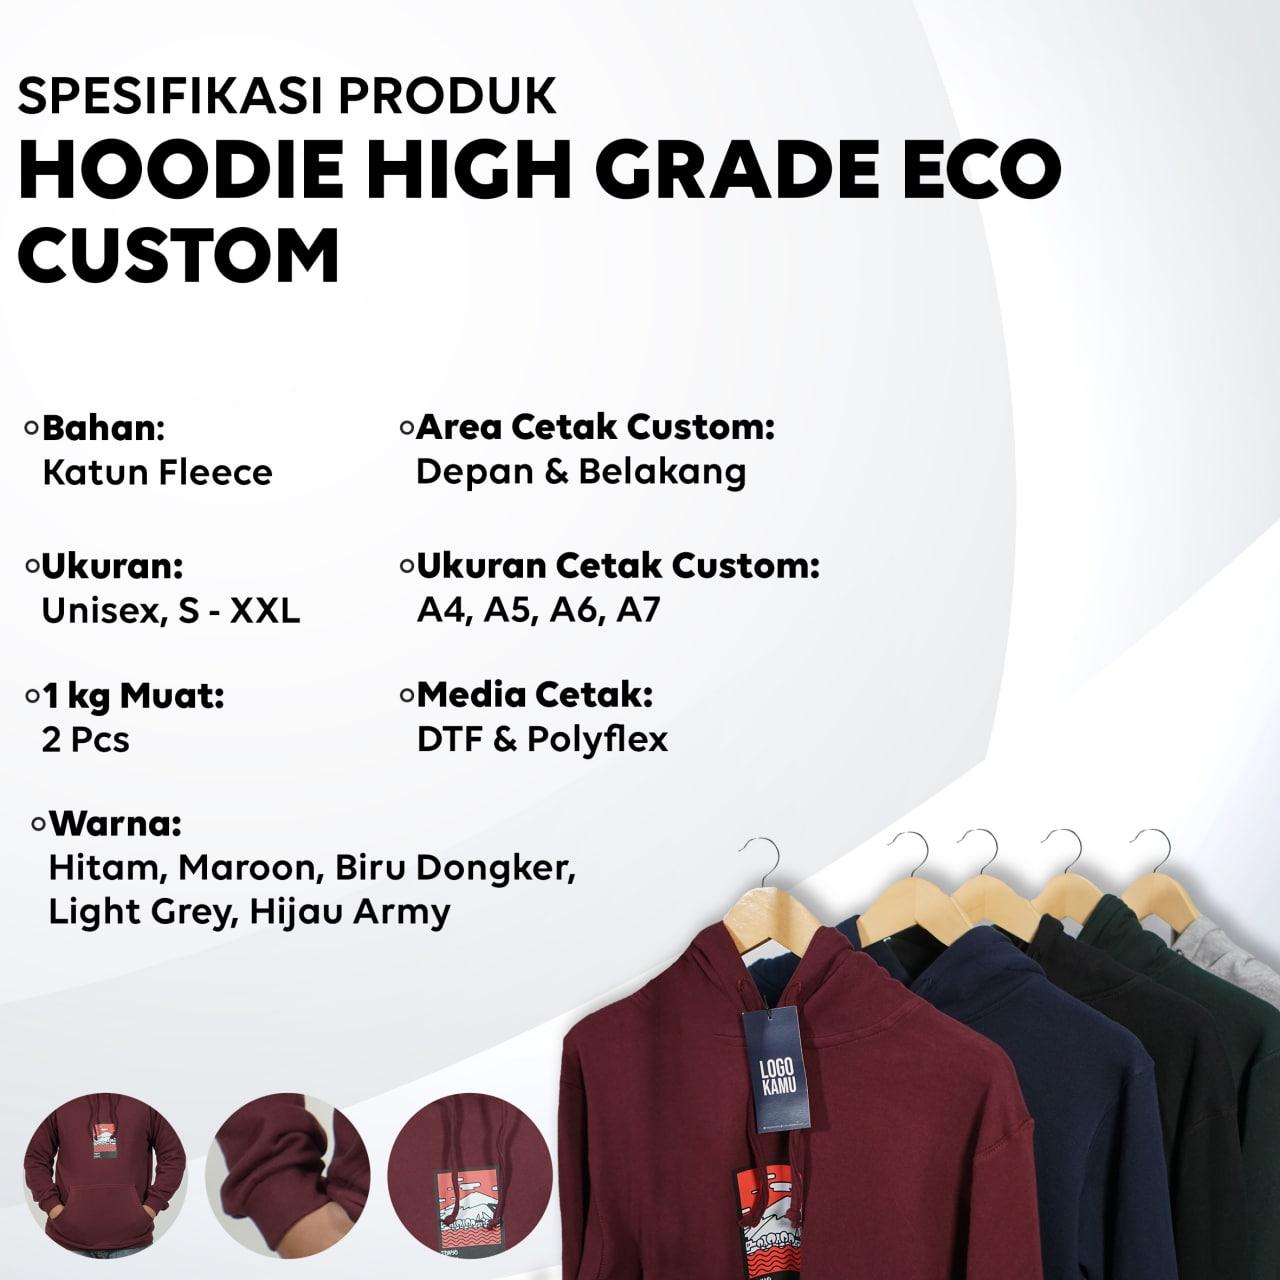 Spesifikasi Hoodie High Grade Eco